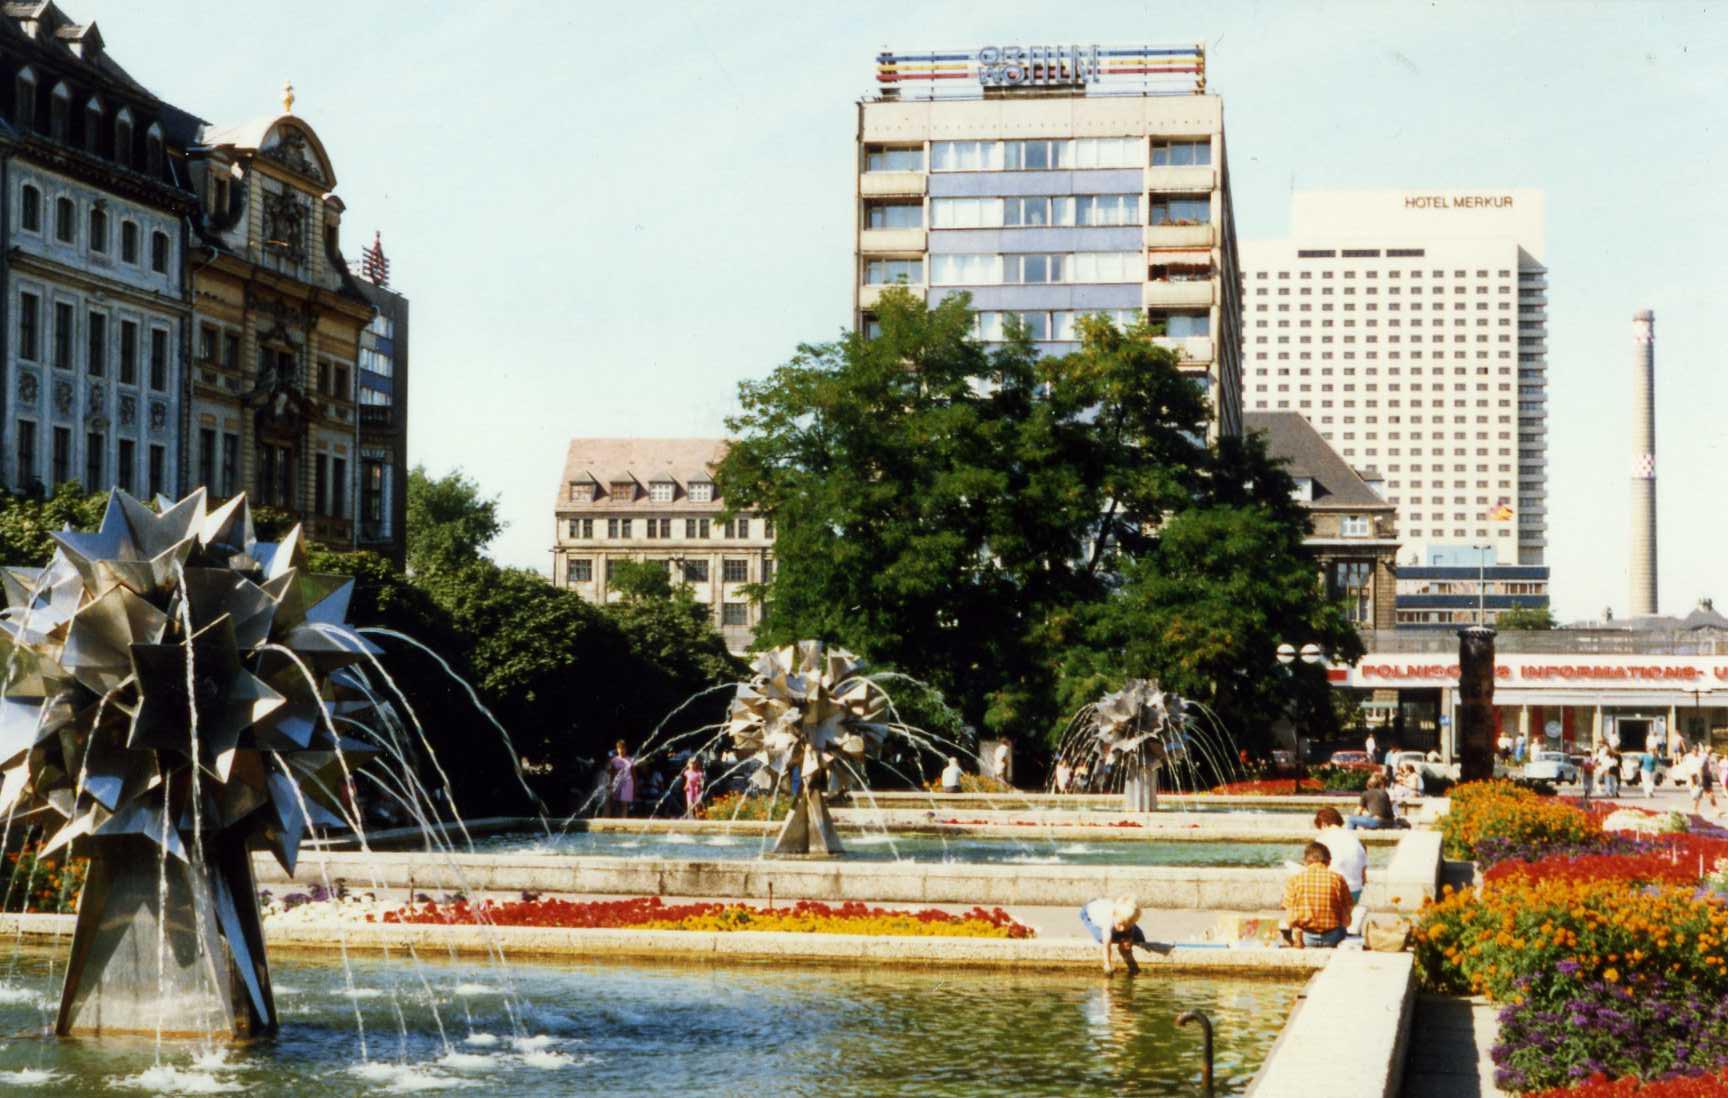 Merkur Hotel Leipzig